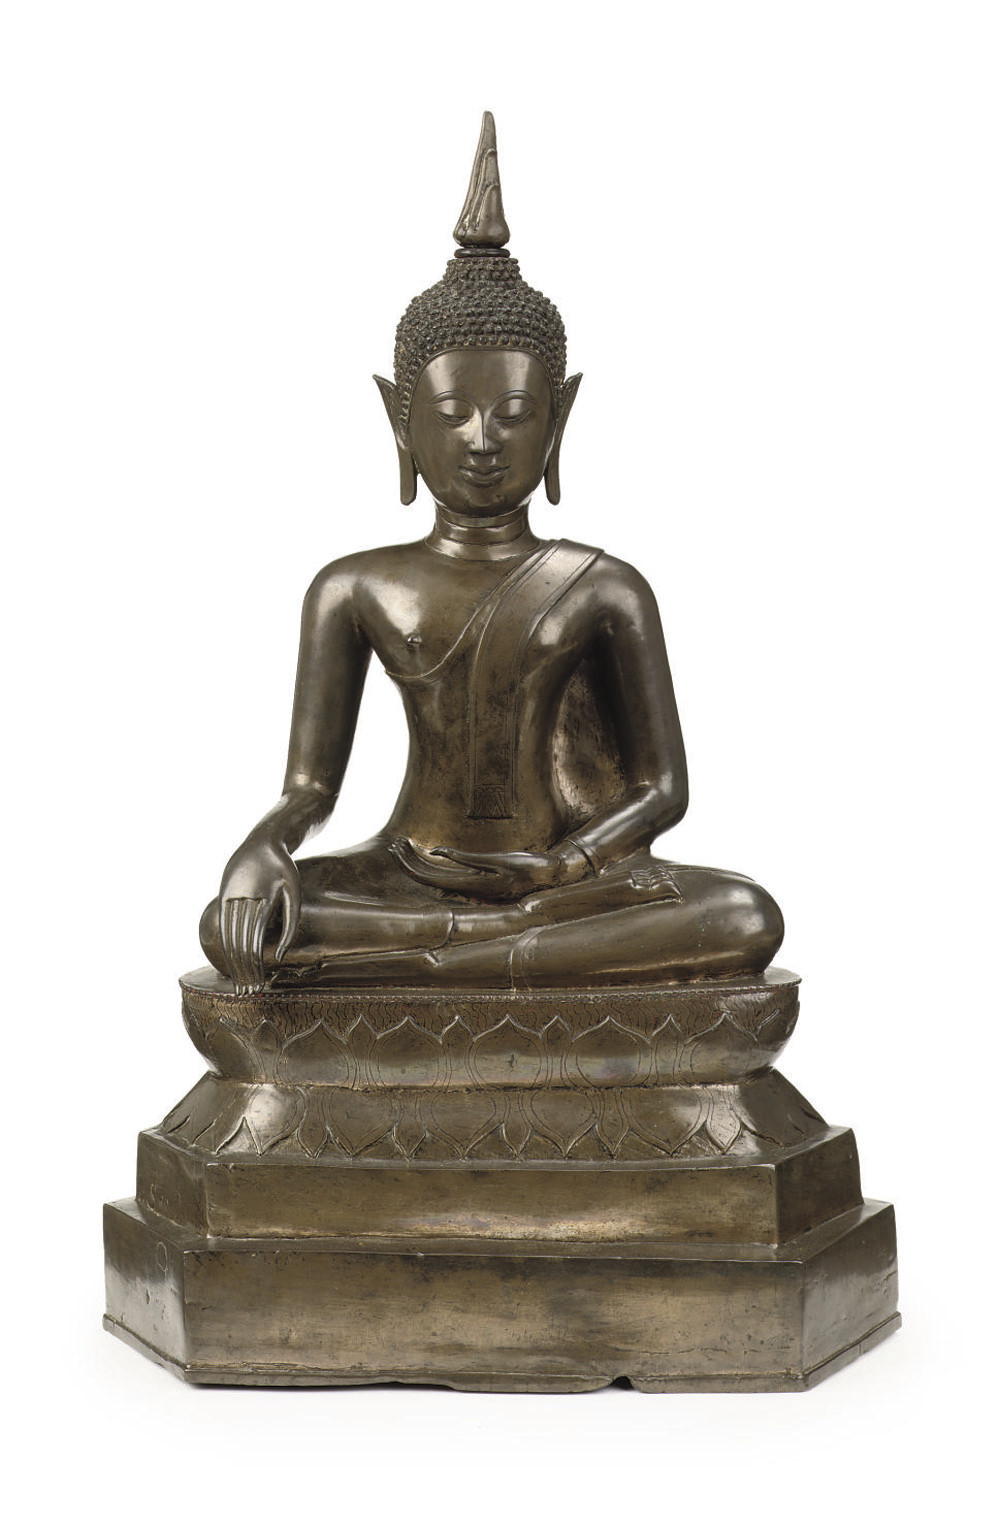 A Thai bronze Ayutthaya-style